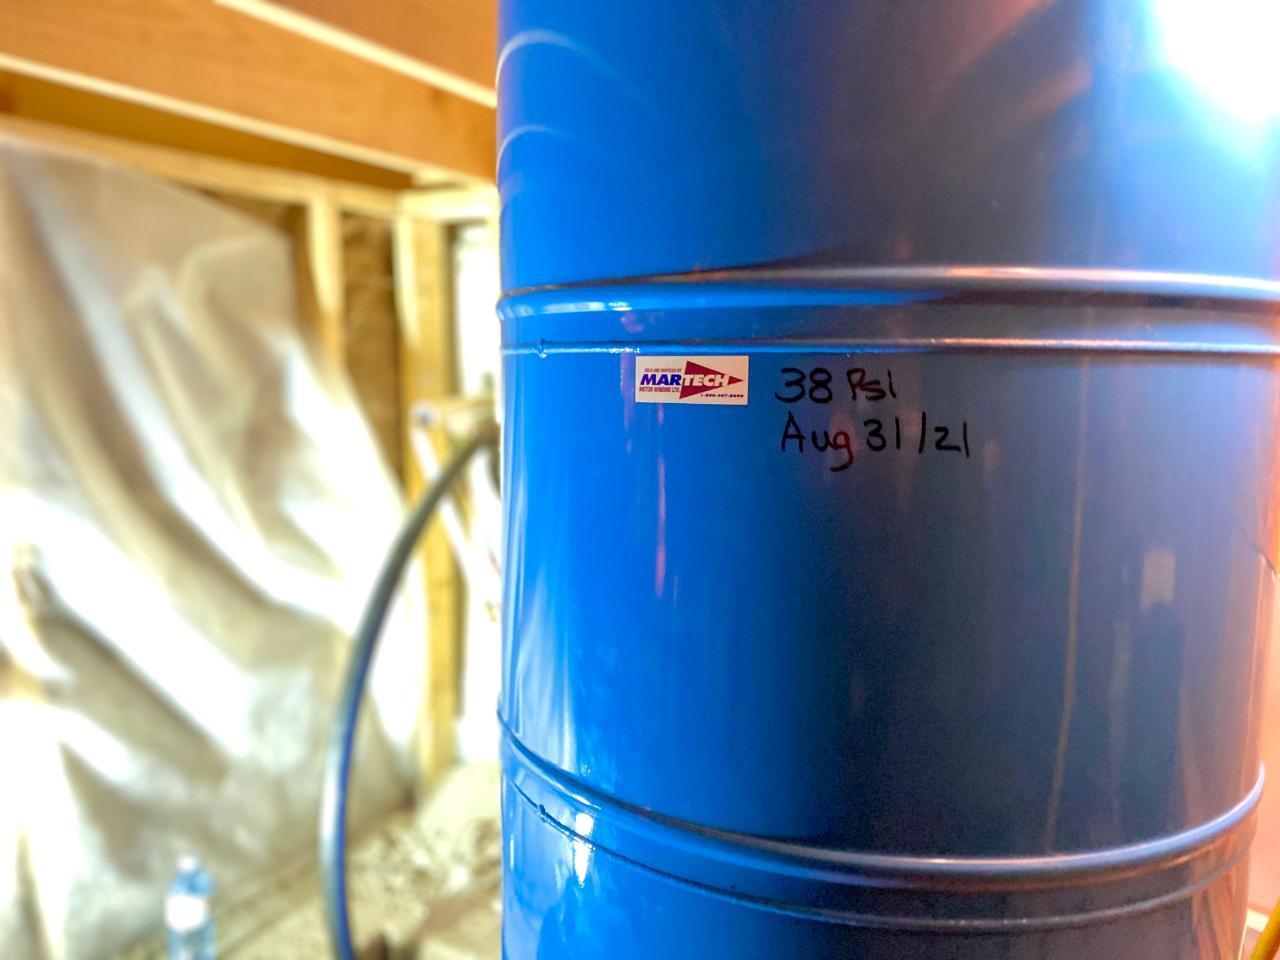 2505 Barley Road, Rossland, British Columbia  V0G 1Y0 - Photo 84 - 2461148